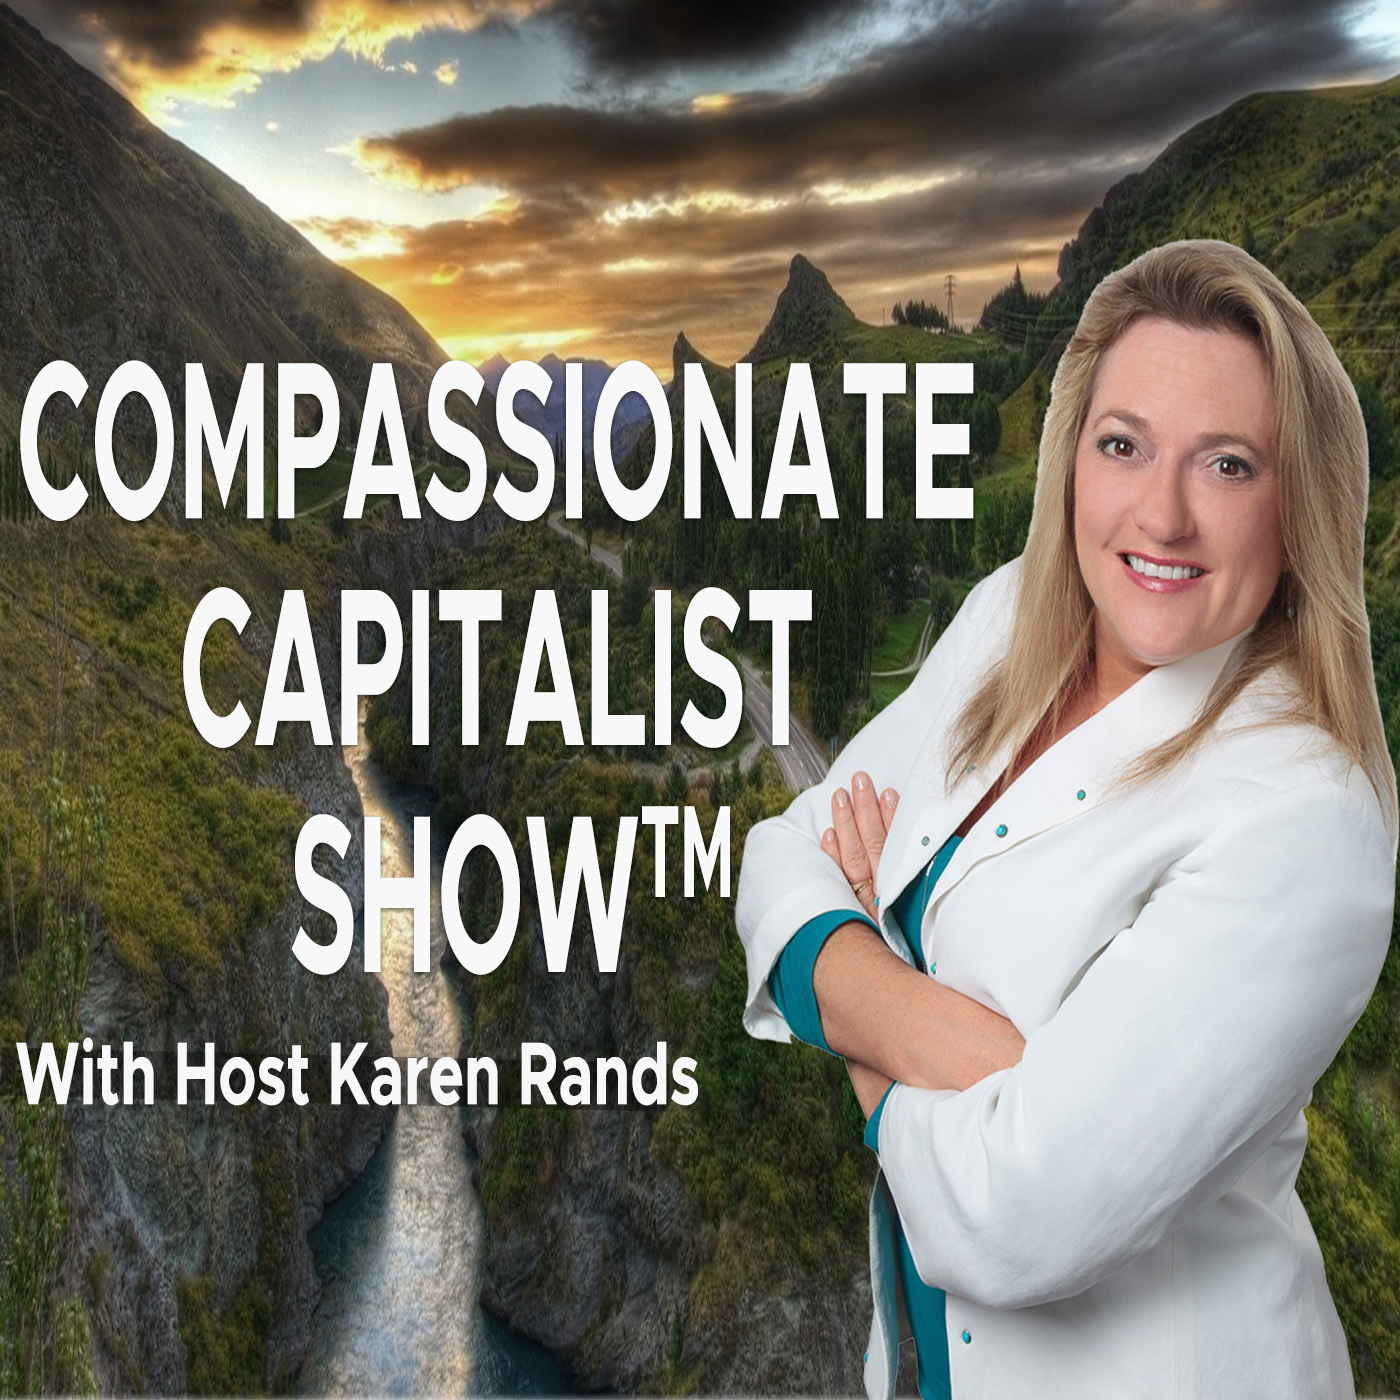 Karen Rands - Compassionate Capitalist Show